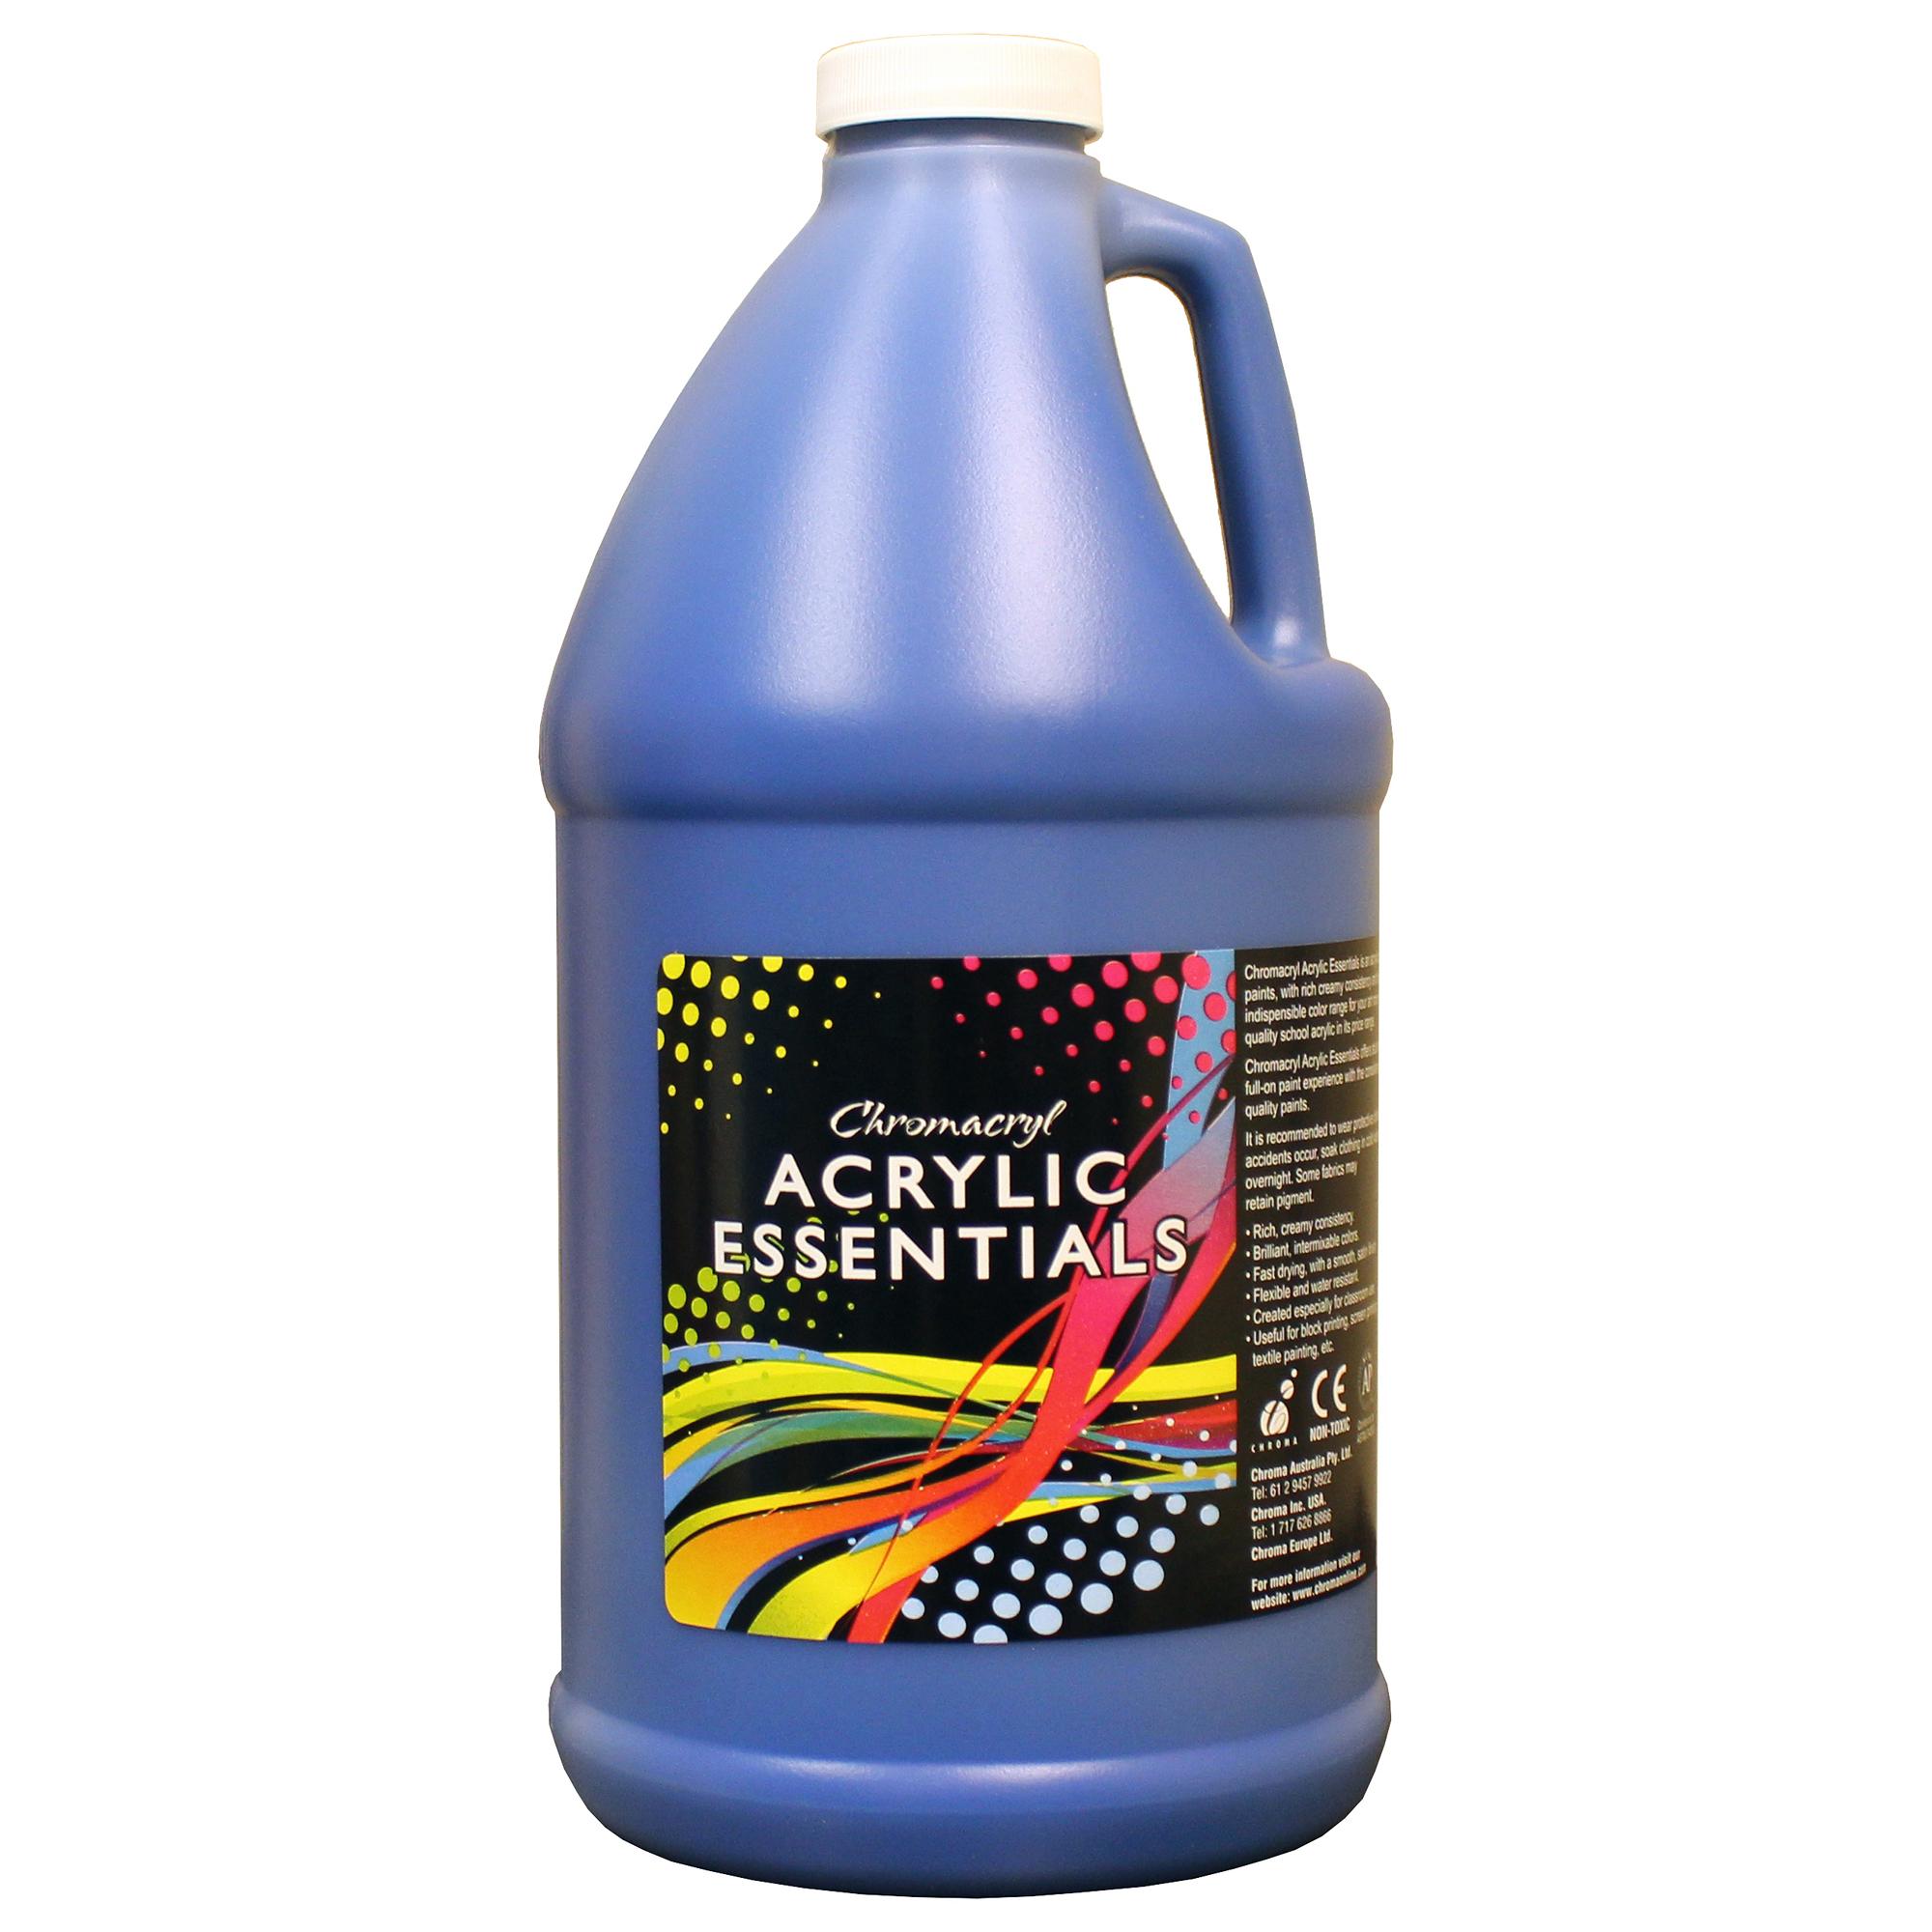 Hc421661 Chromacryl Acrylic Essentials Acrylic Paint In Cool Blue 2 Litre Bottle Findel International